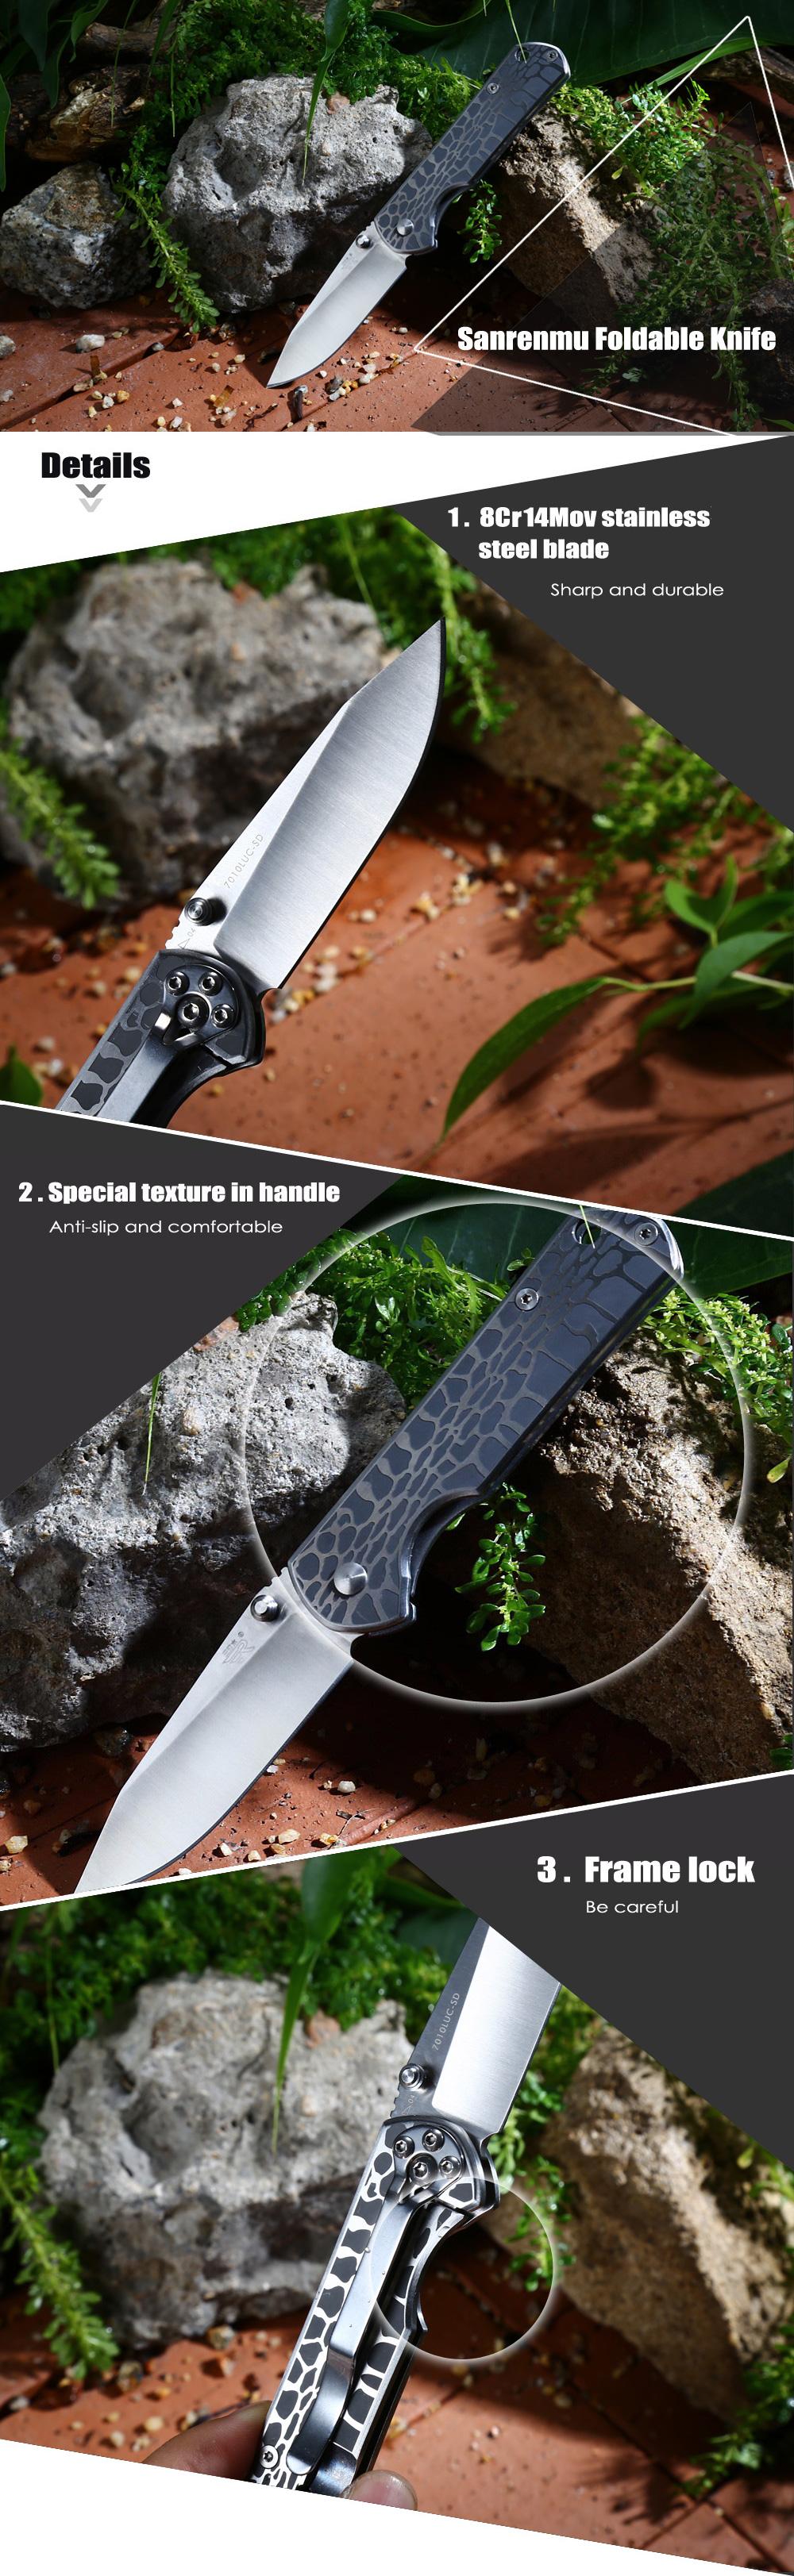 Sanrenmu 7010 LUC - SD Frame Lock Foldable Knife  -  SILVER - sanrenmu knives, knife, knife hiking, knife travel